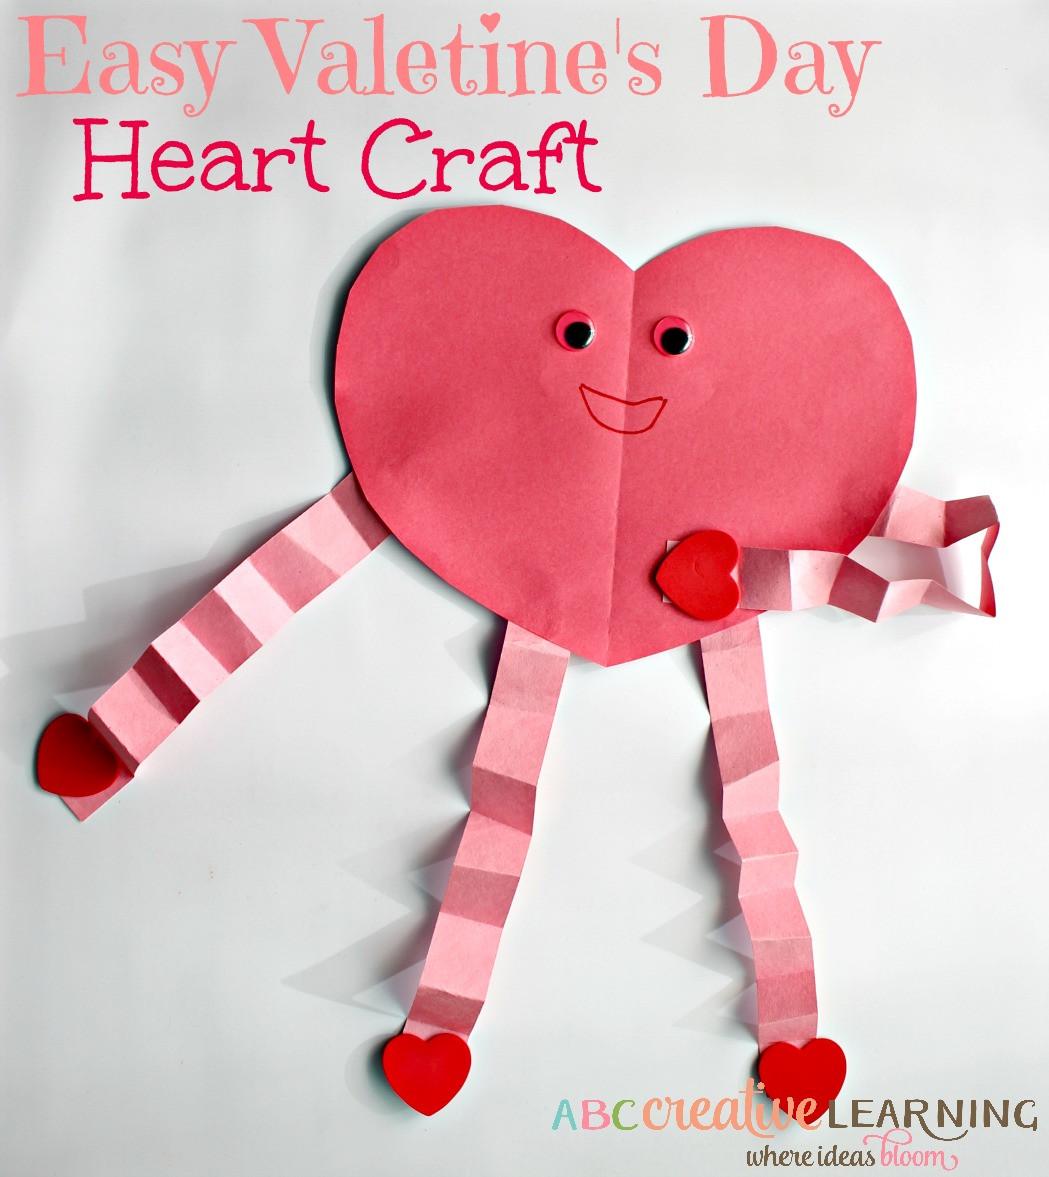 Valentine'S Day Craft Ideas For Preschoolers  Easy and Cute Valentine s Day Heart Craft For Kids